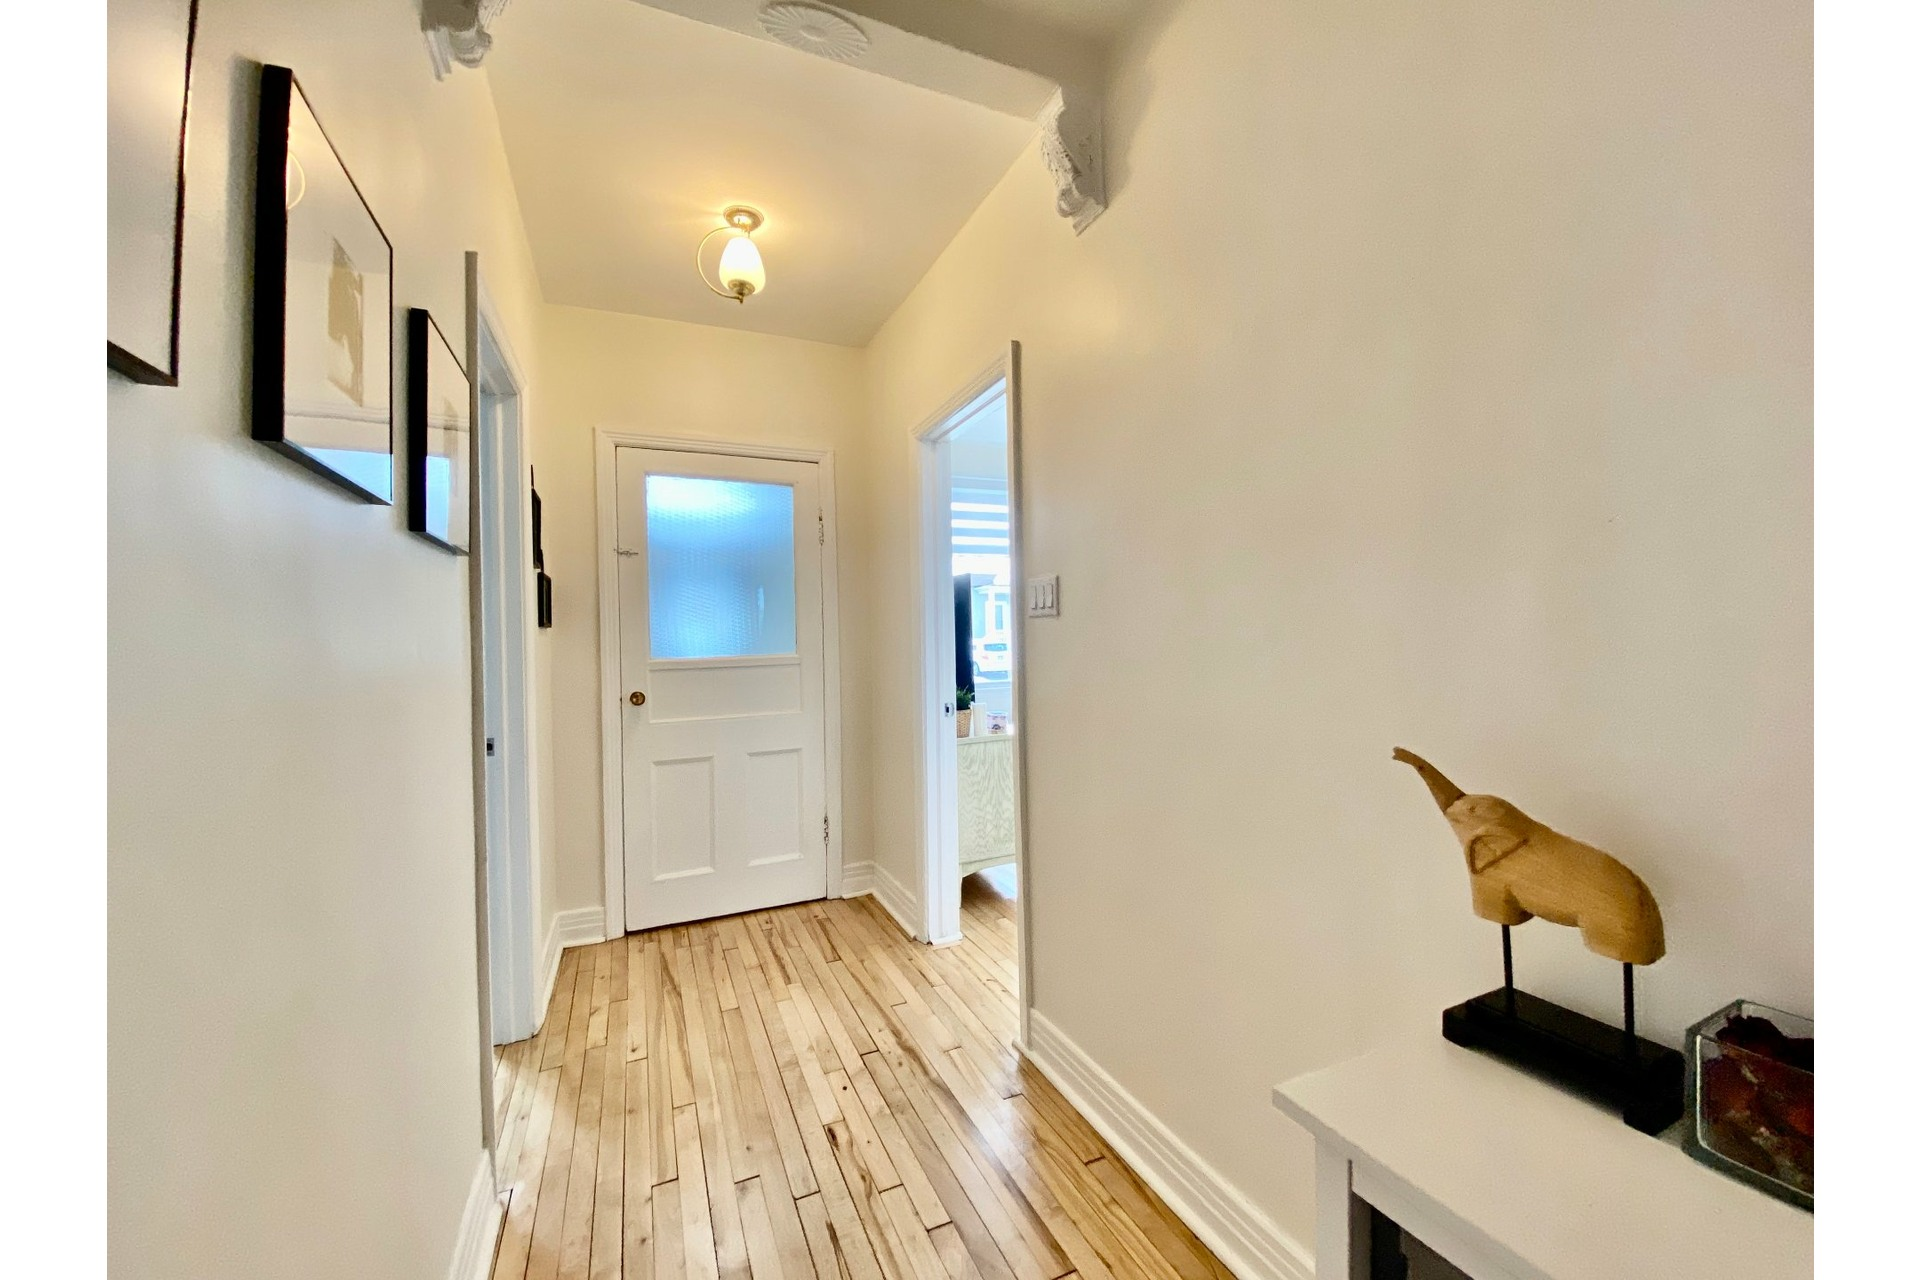 image 4 - Duplex En venta Lachine Montréal  - 6 habitaciones